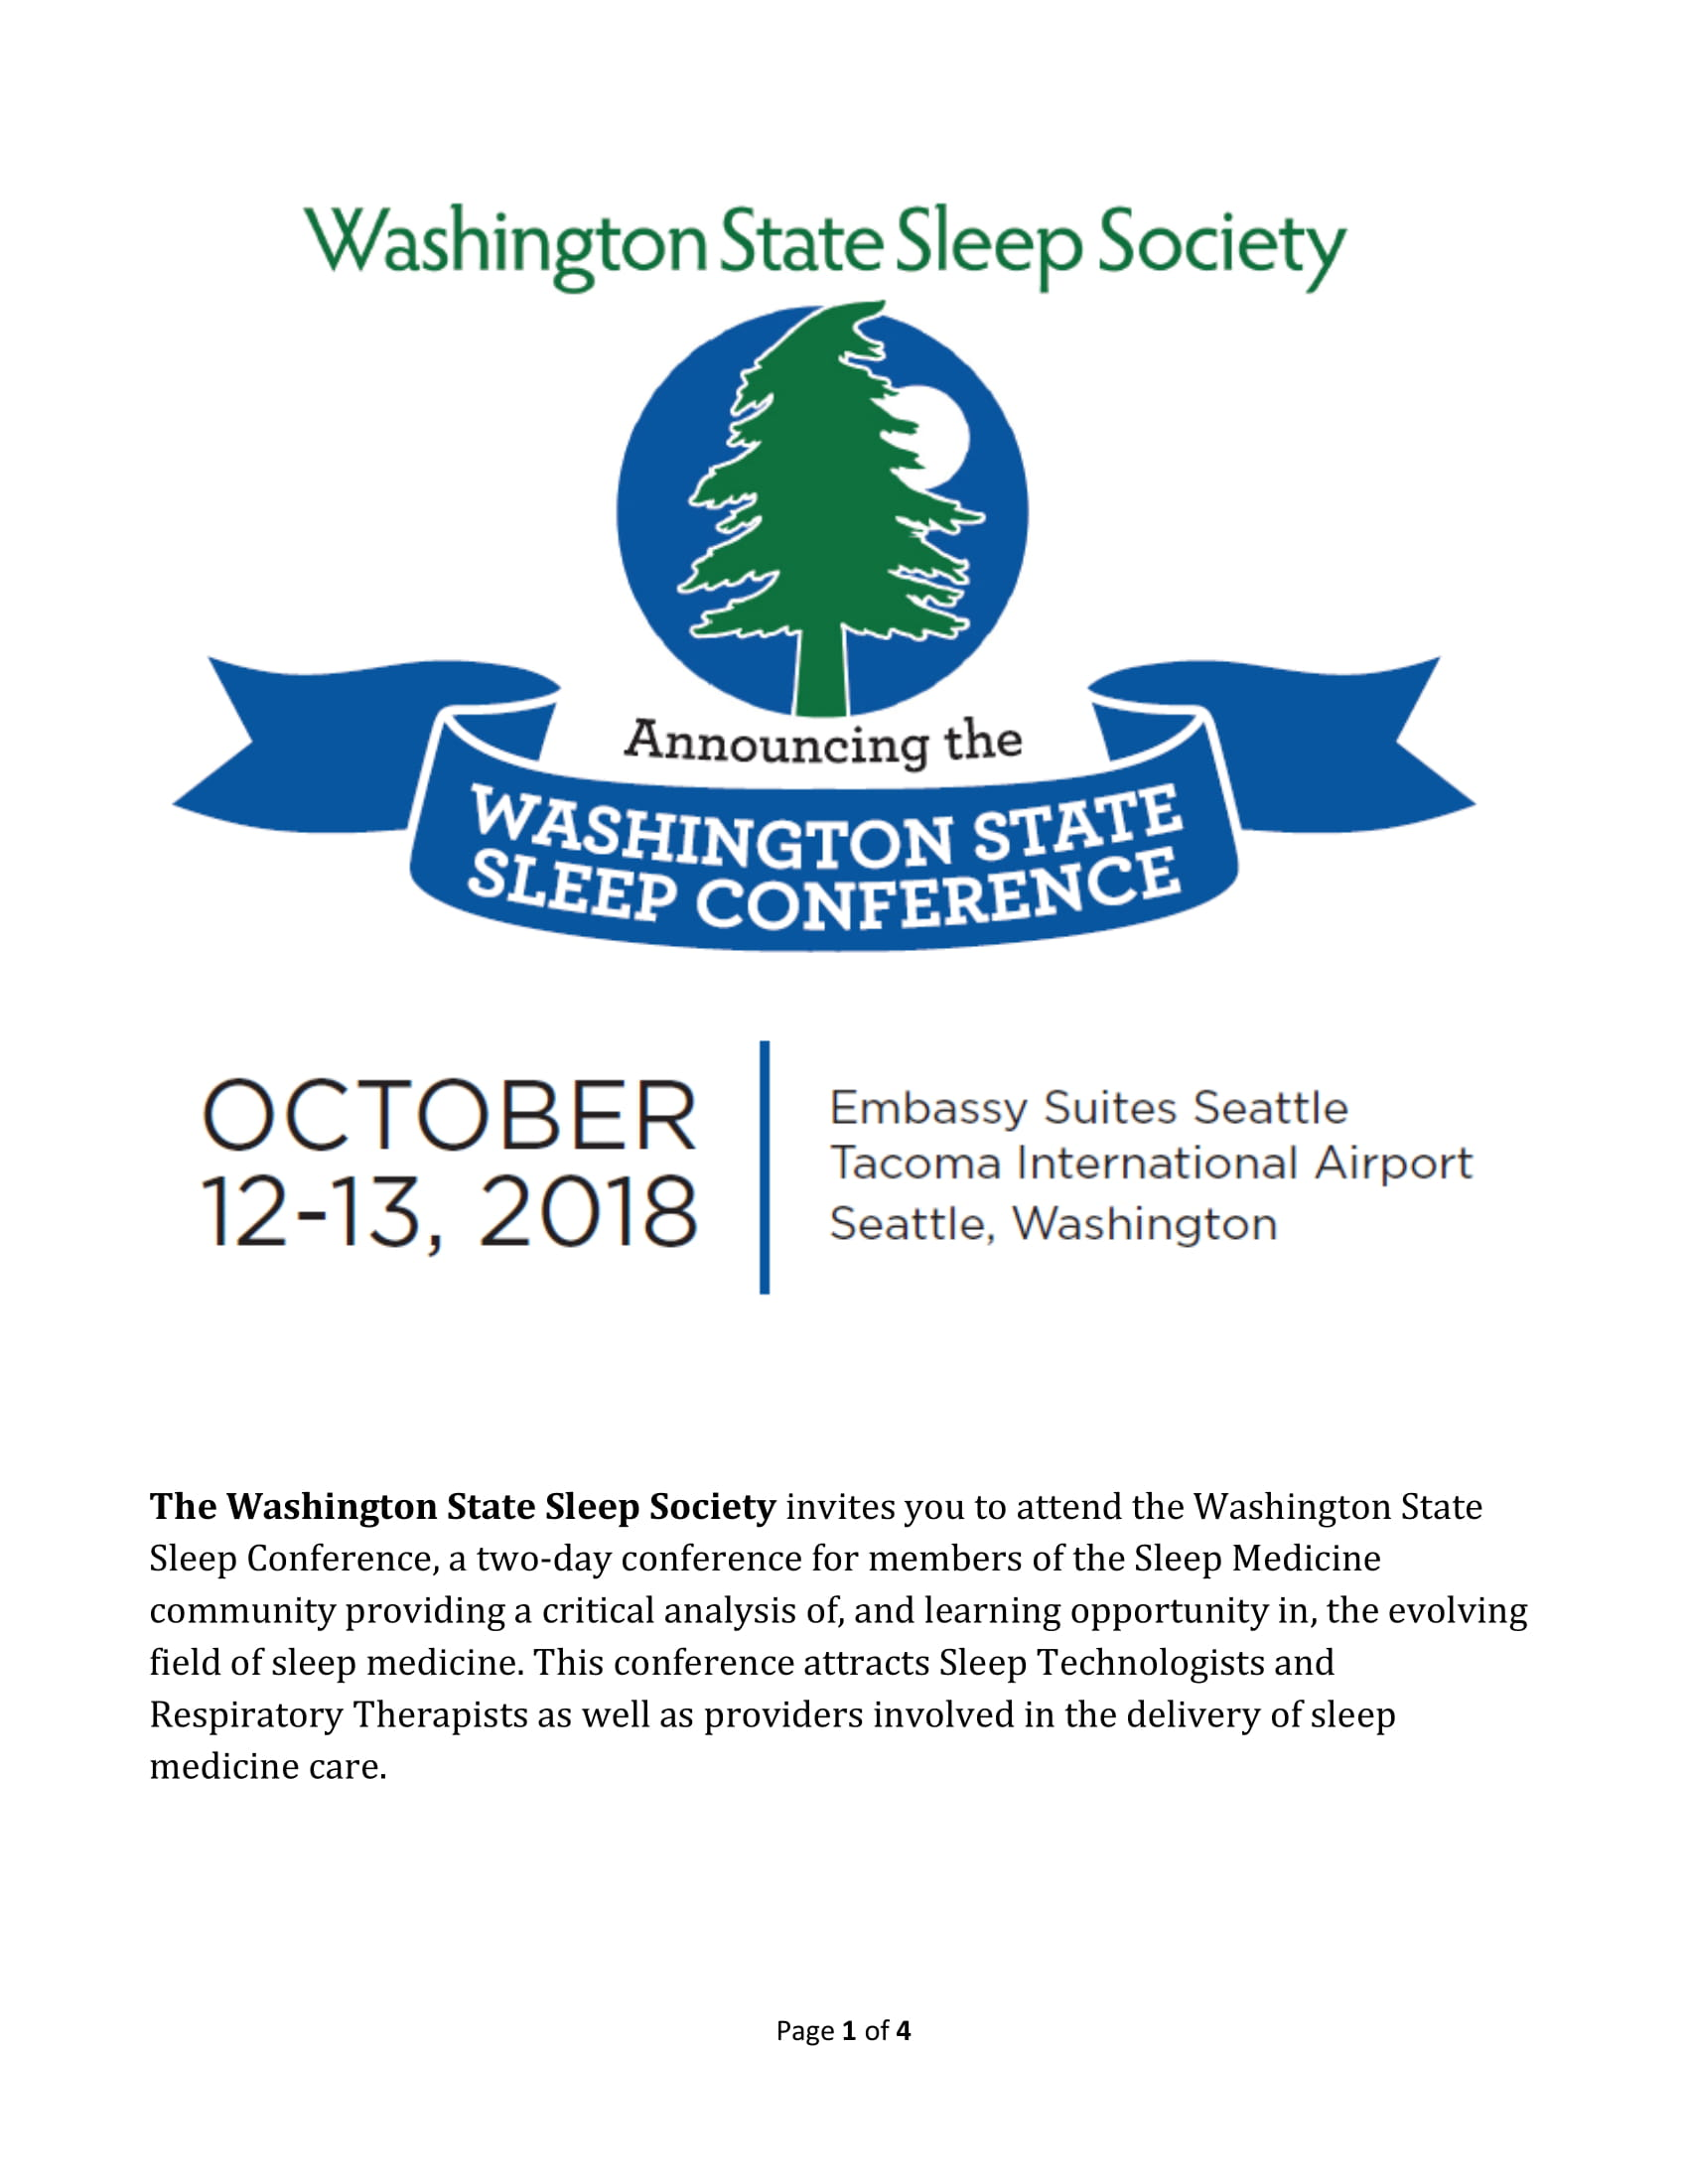 2018 Washington State Sleep Conference_20ANEN-1